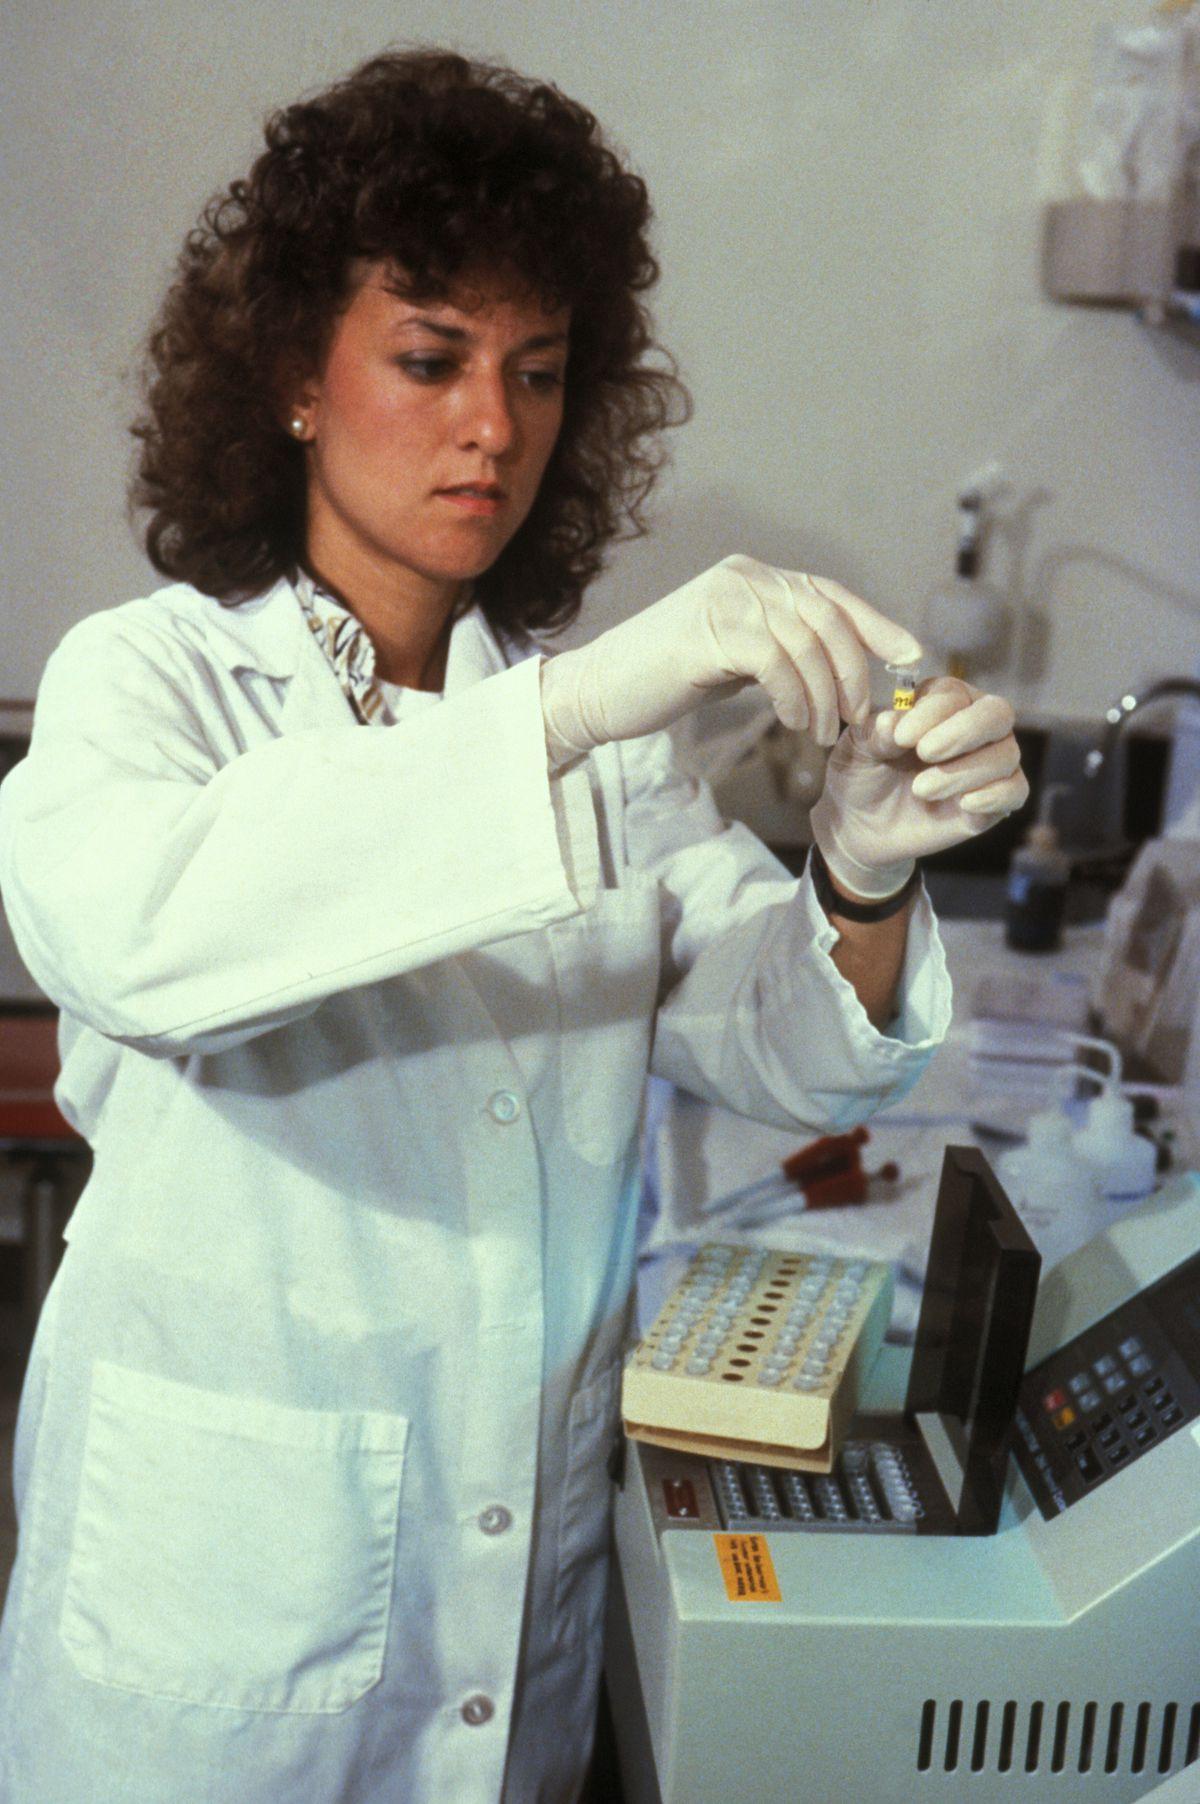 A coronavirus vaccine may take longer than 12 to 18 months